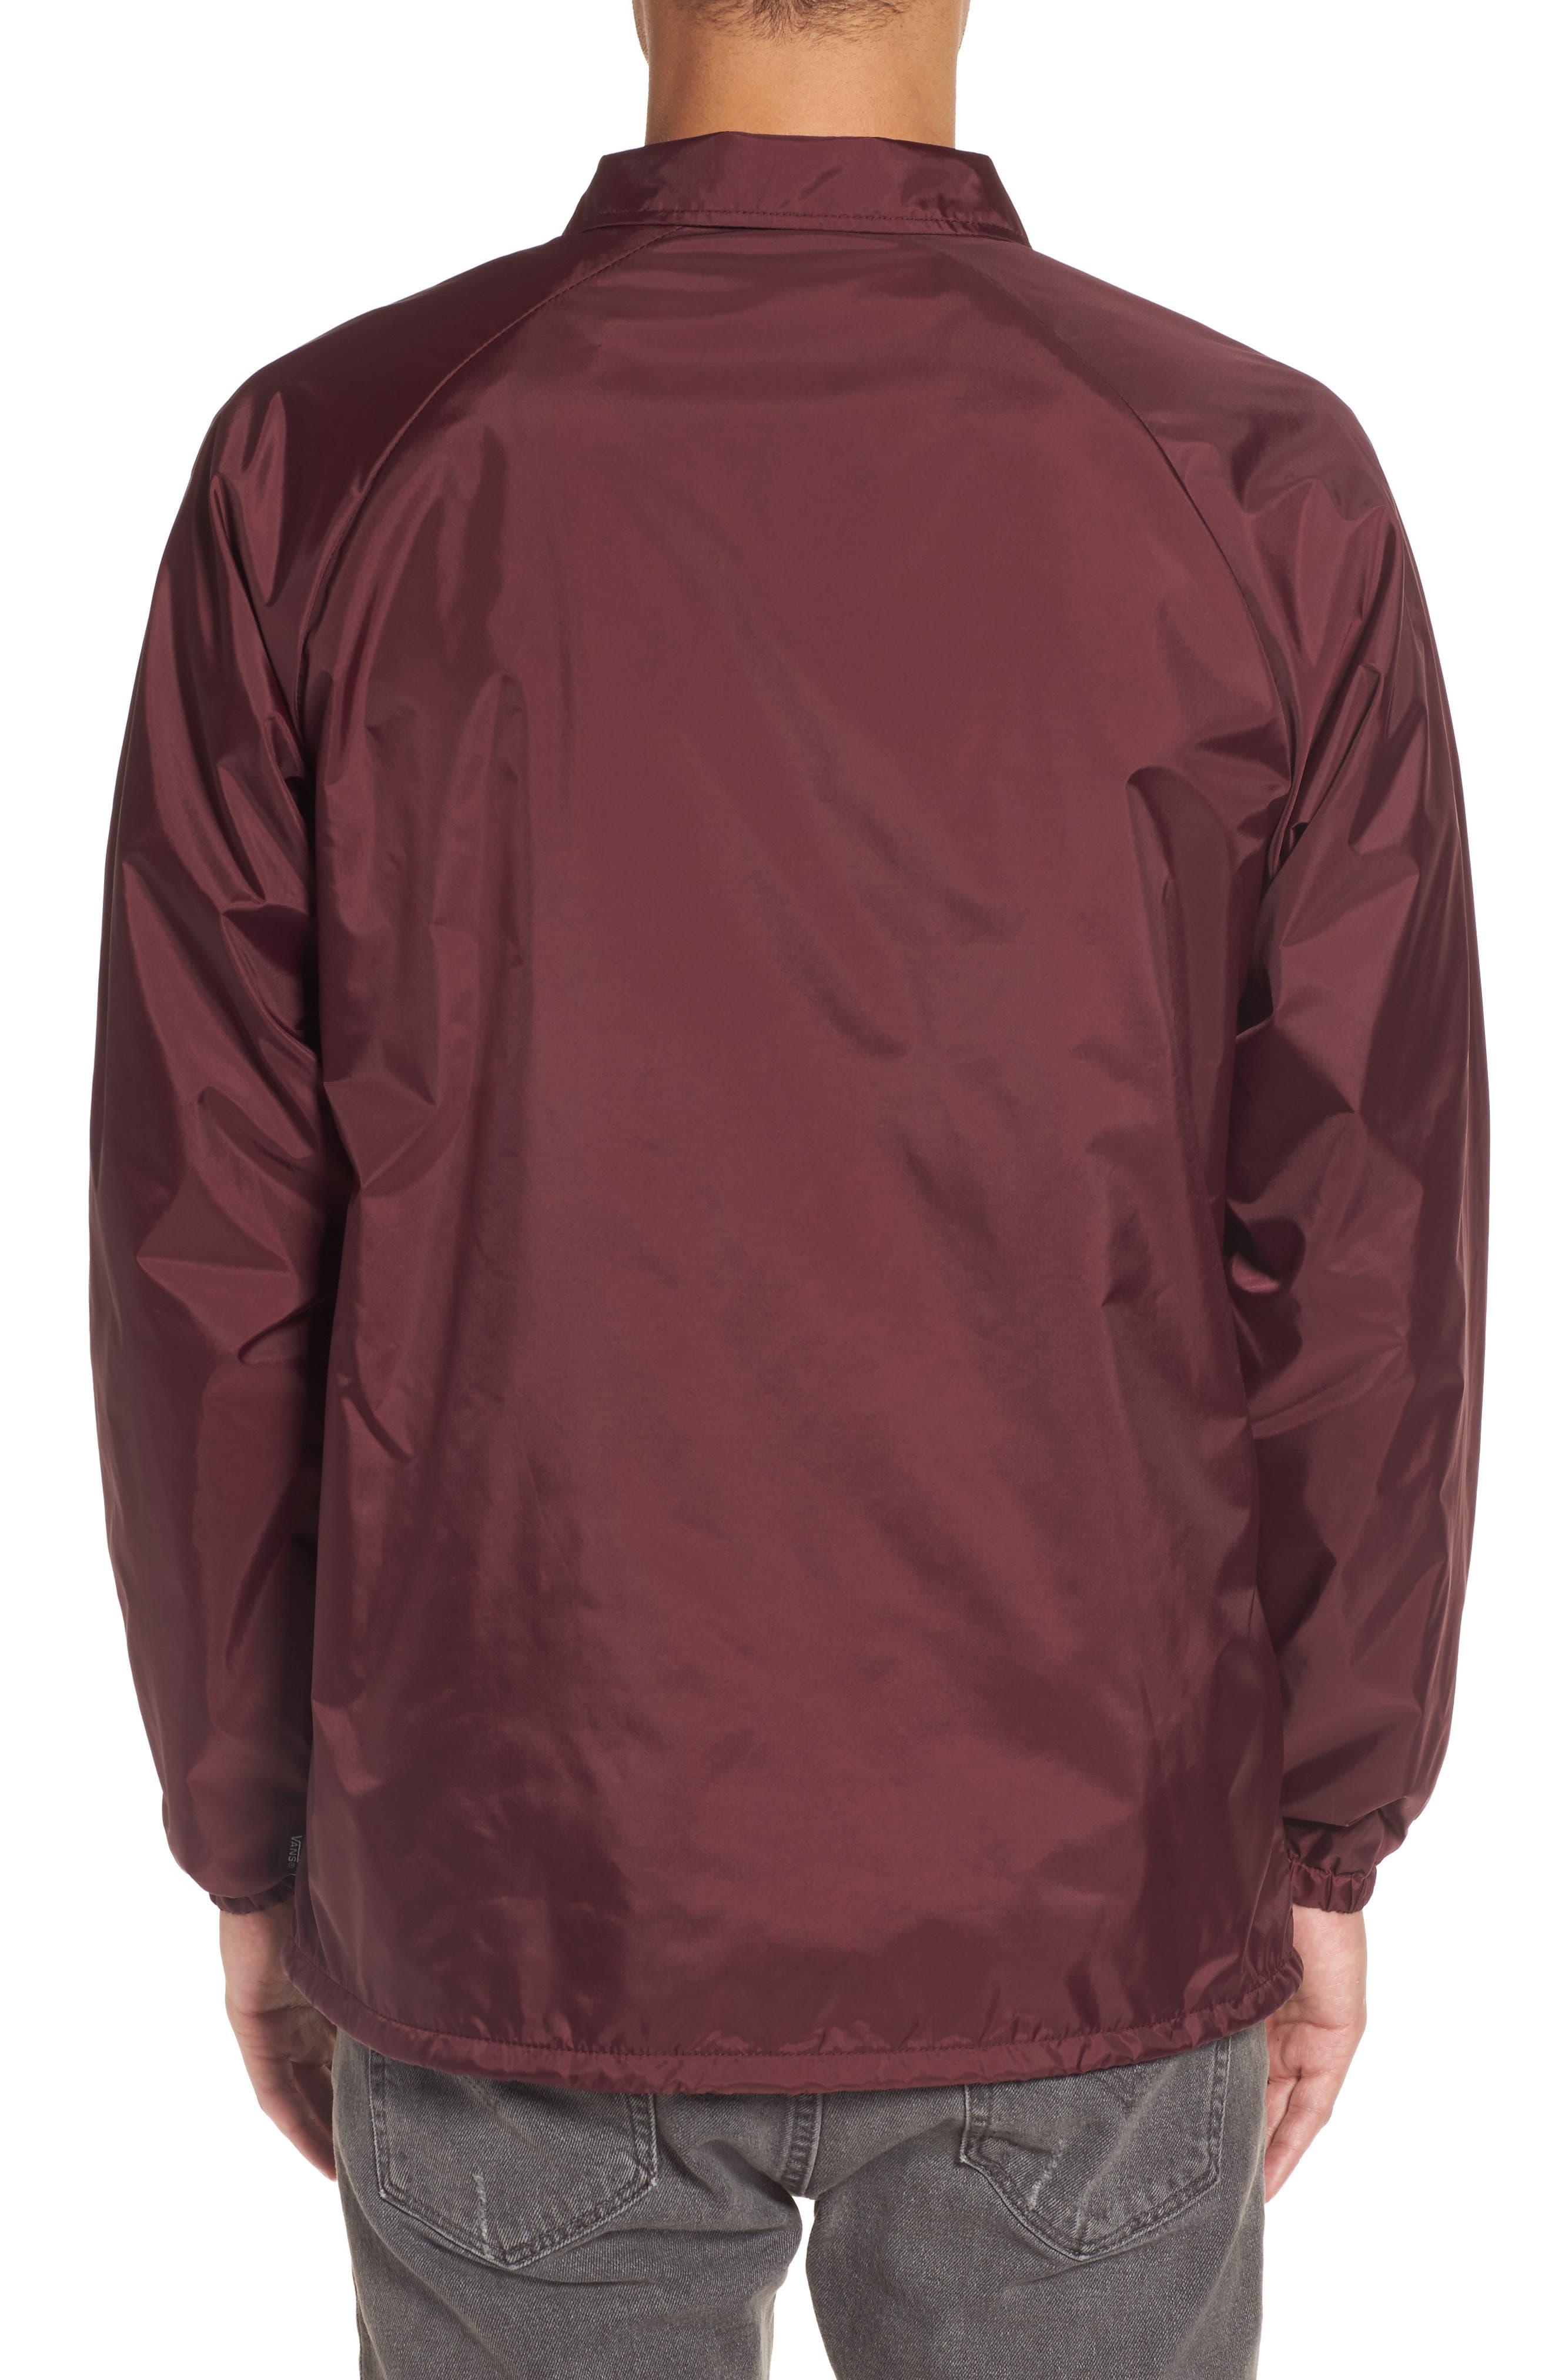 Torrey Water Resistant Jacket,                             Alternate thumbnail 2, color,                             Port Royale/ White